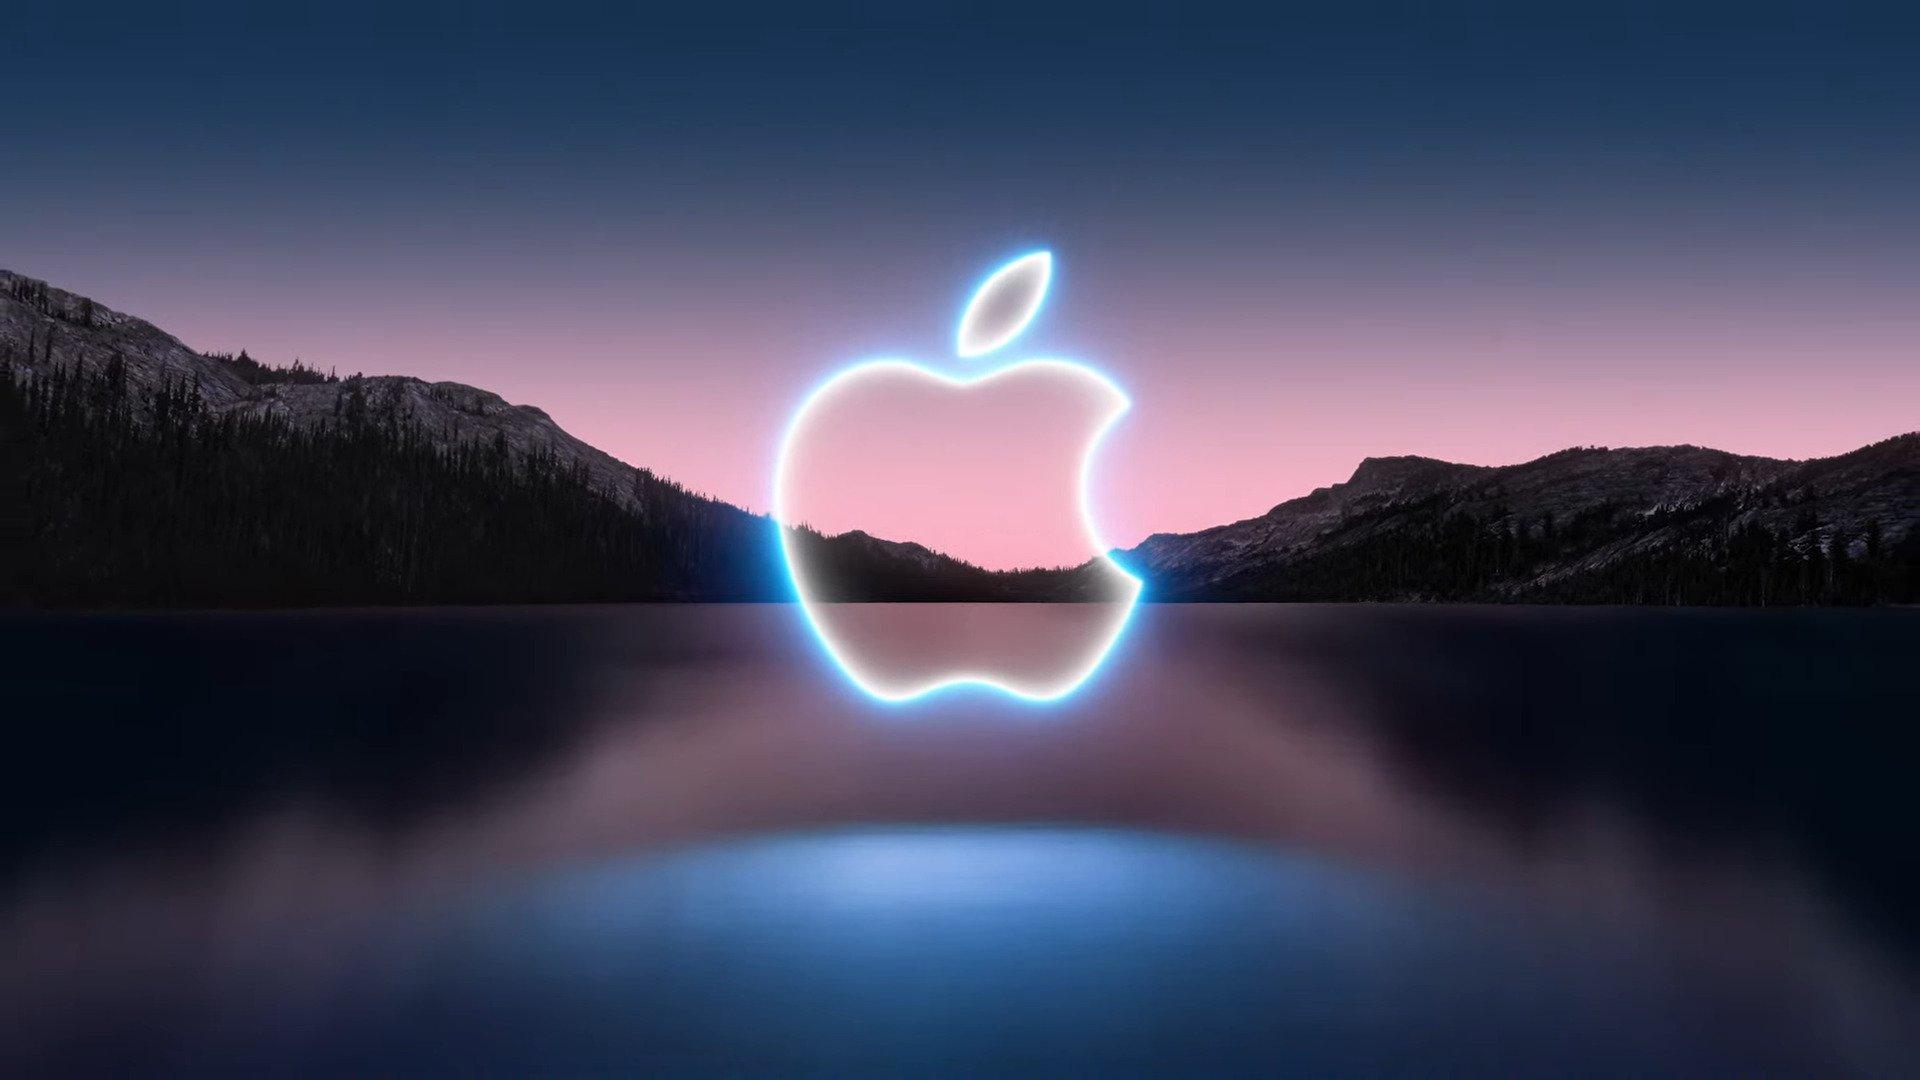 apple-event-september-14-0-23-screenshot.jpg